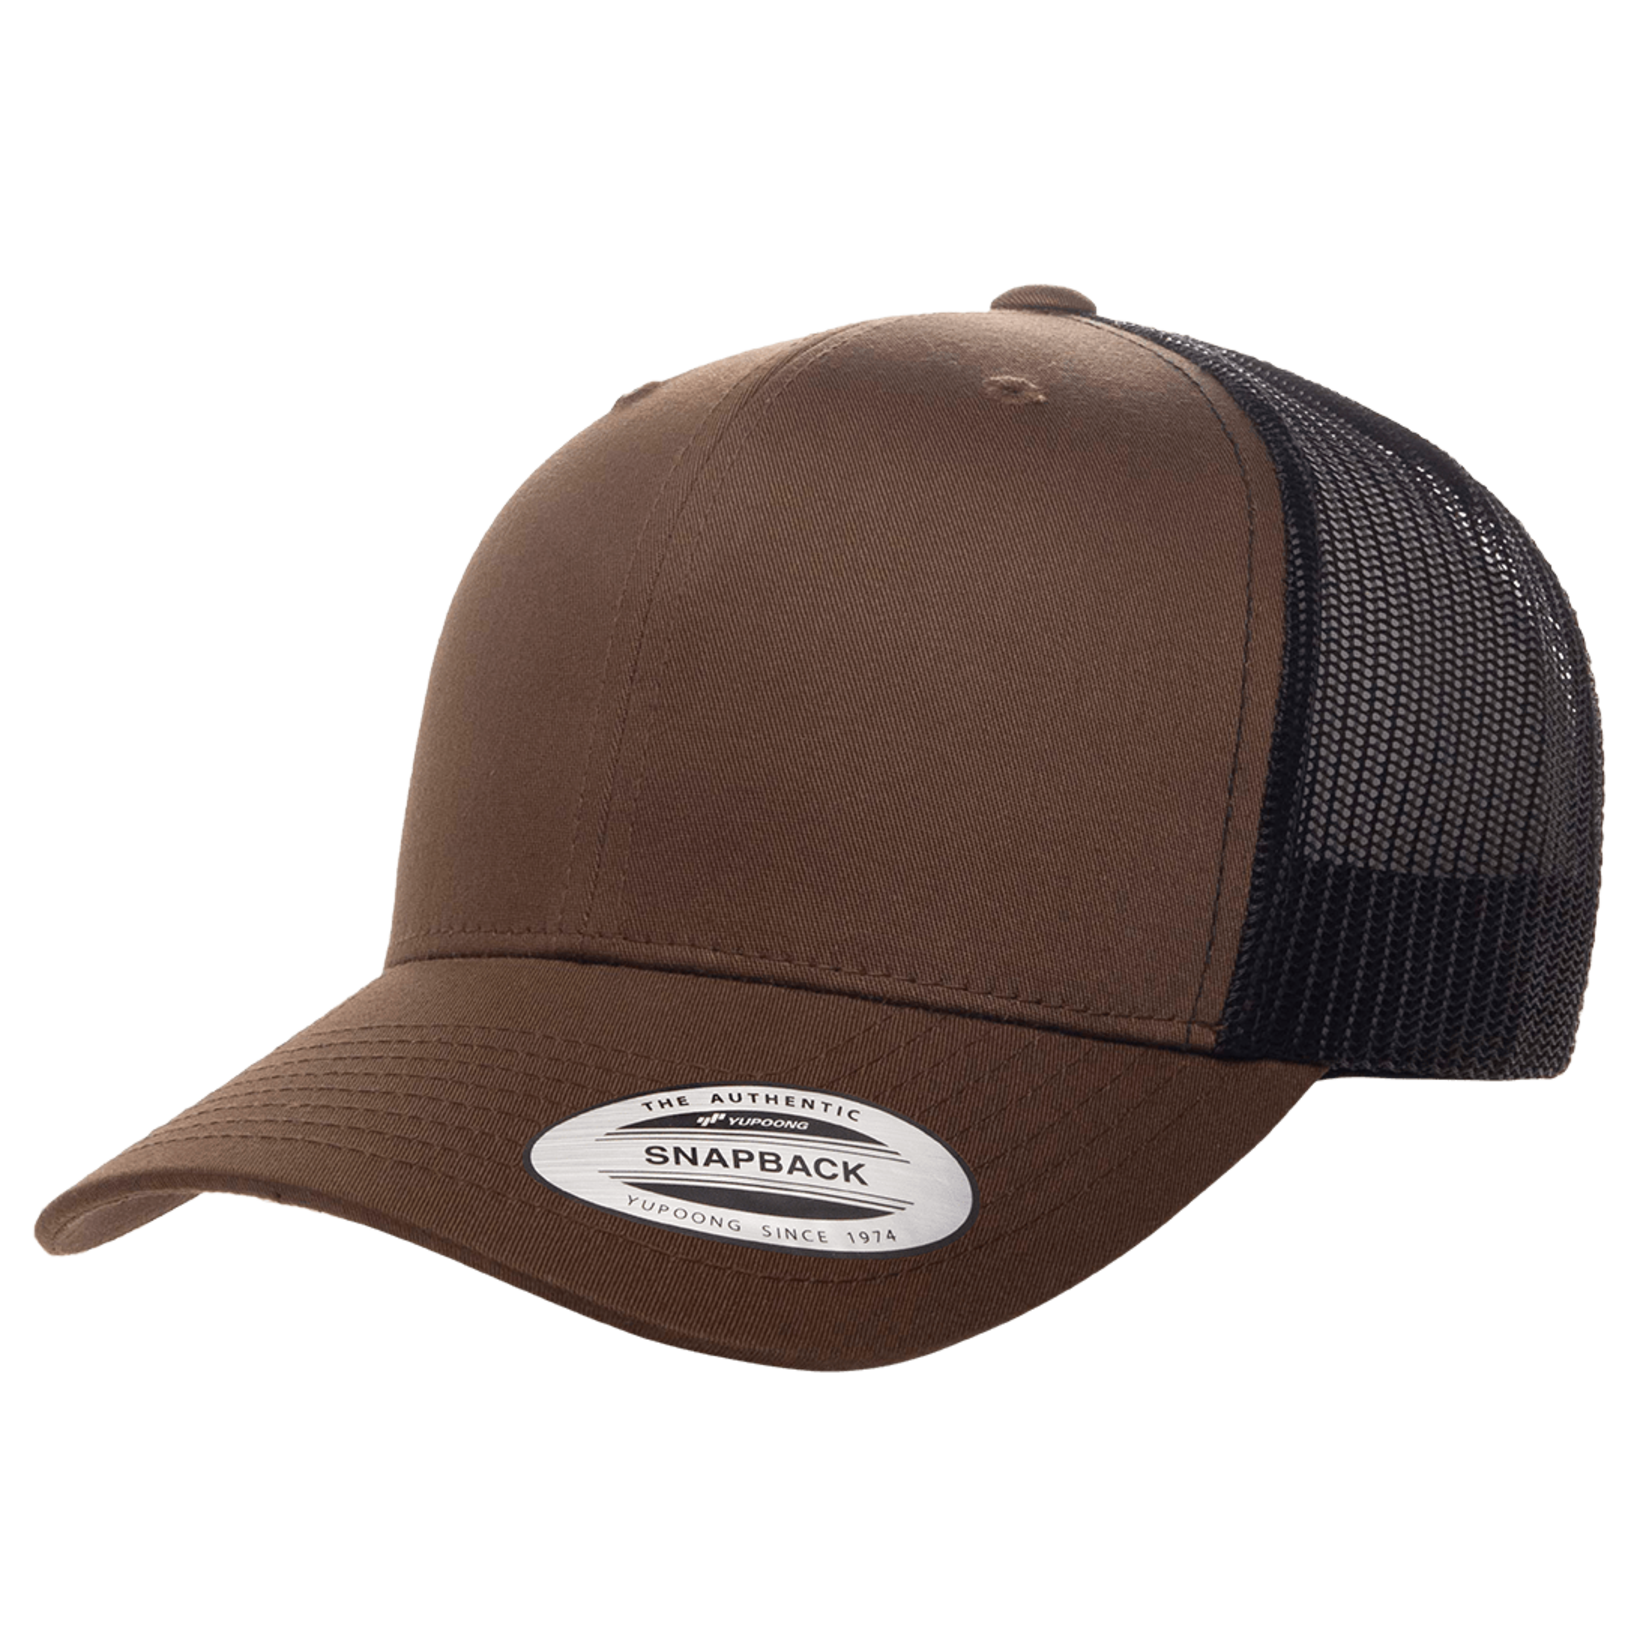 Flexfit Flexfit 6606T 2-Tone Snapback Trucker Hat - Coyote Brown/Black